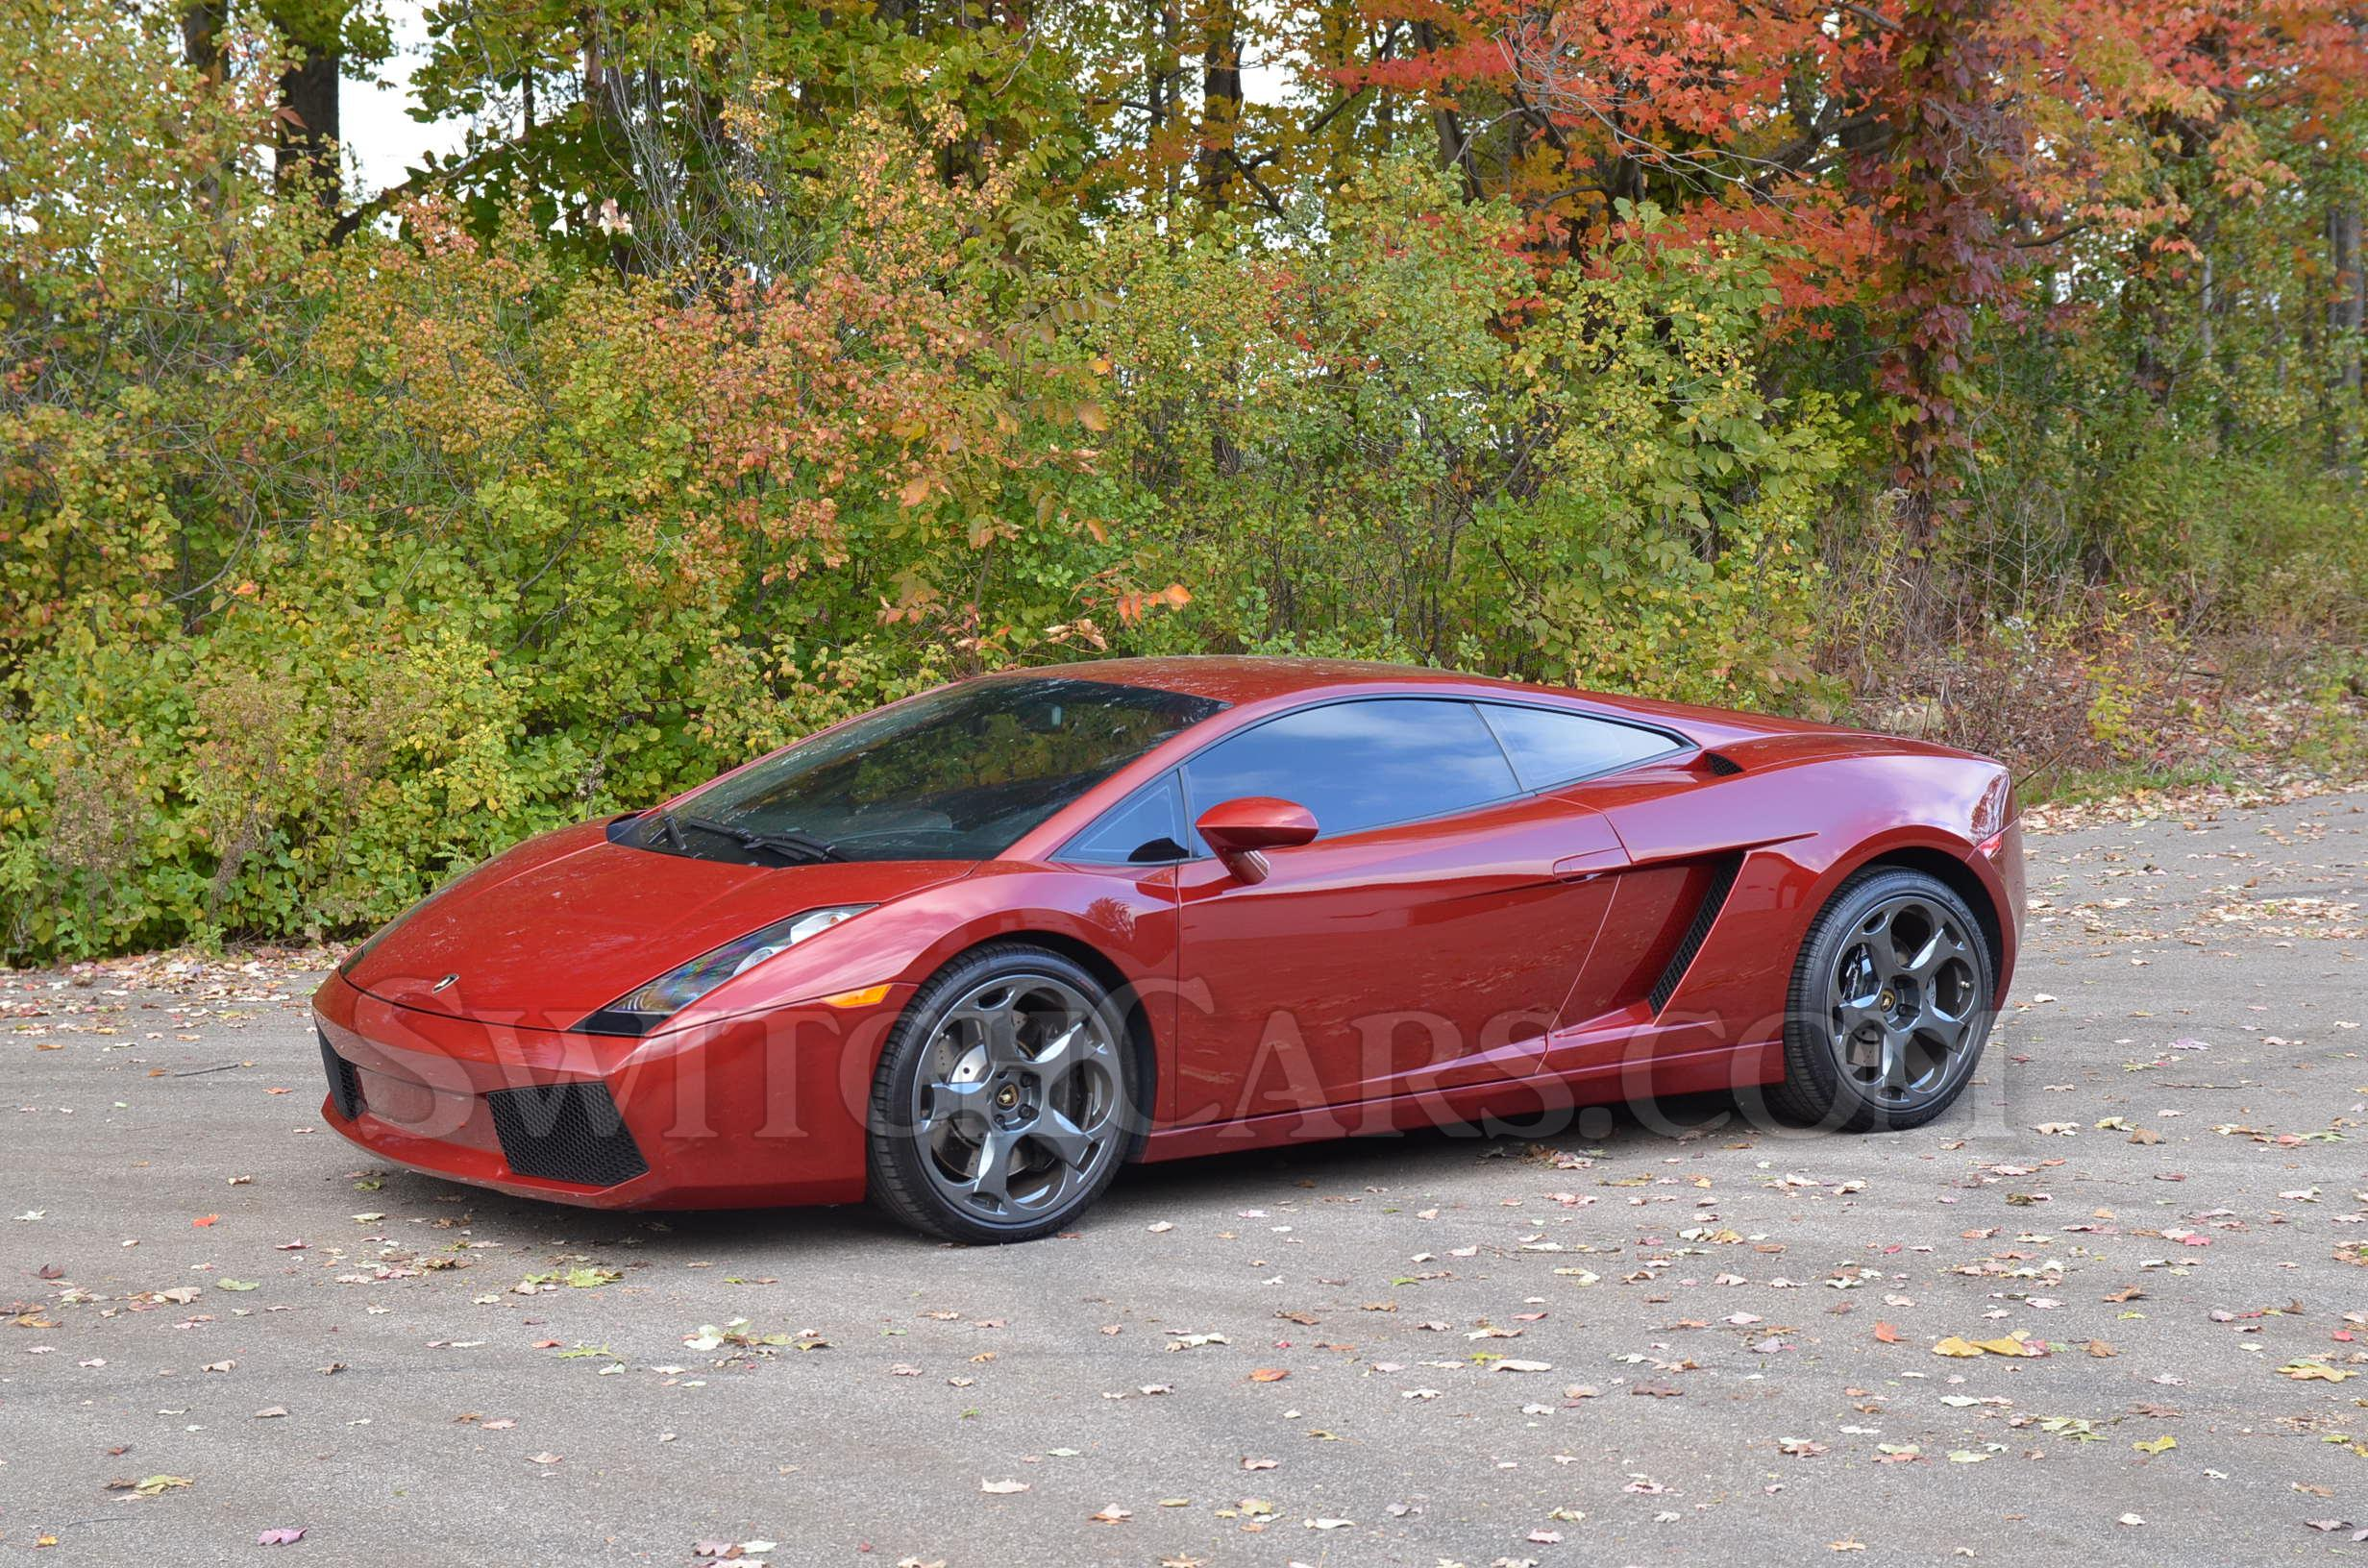 2005 Lamborghini Gallardo 6 Speed Manual At Switchcars Inc Sold